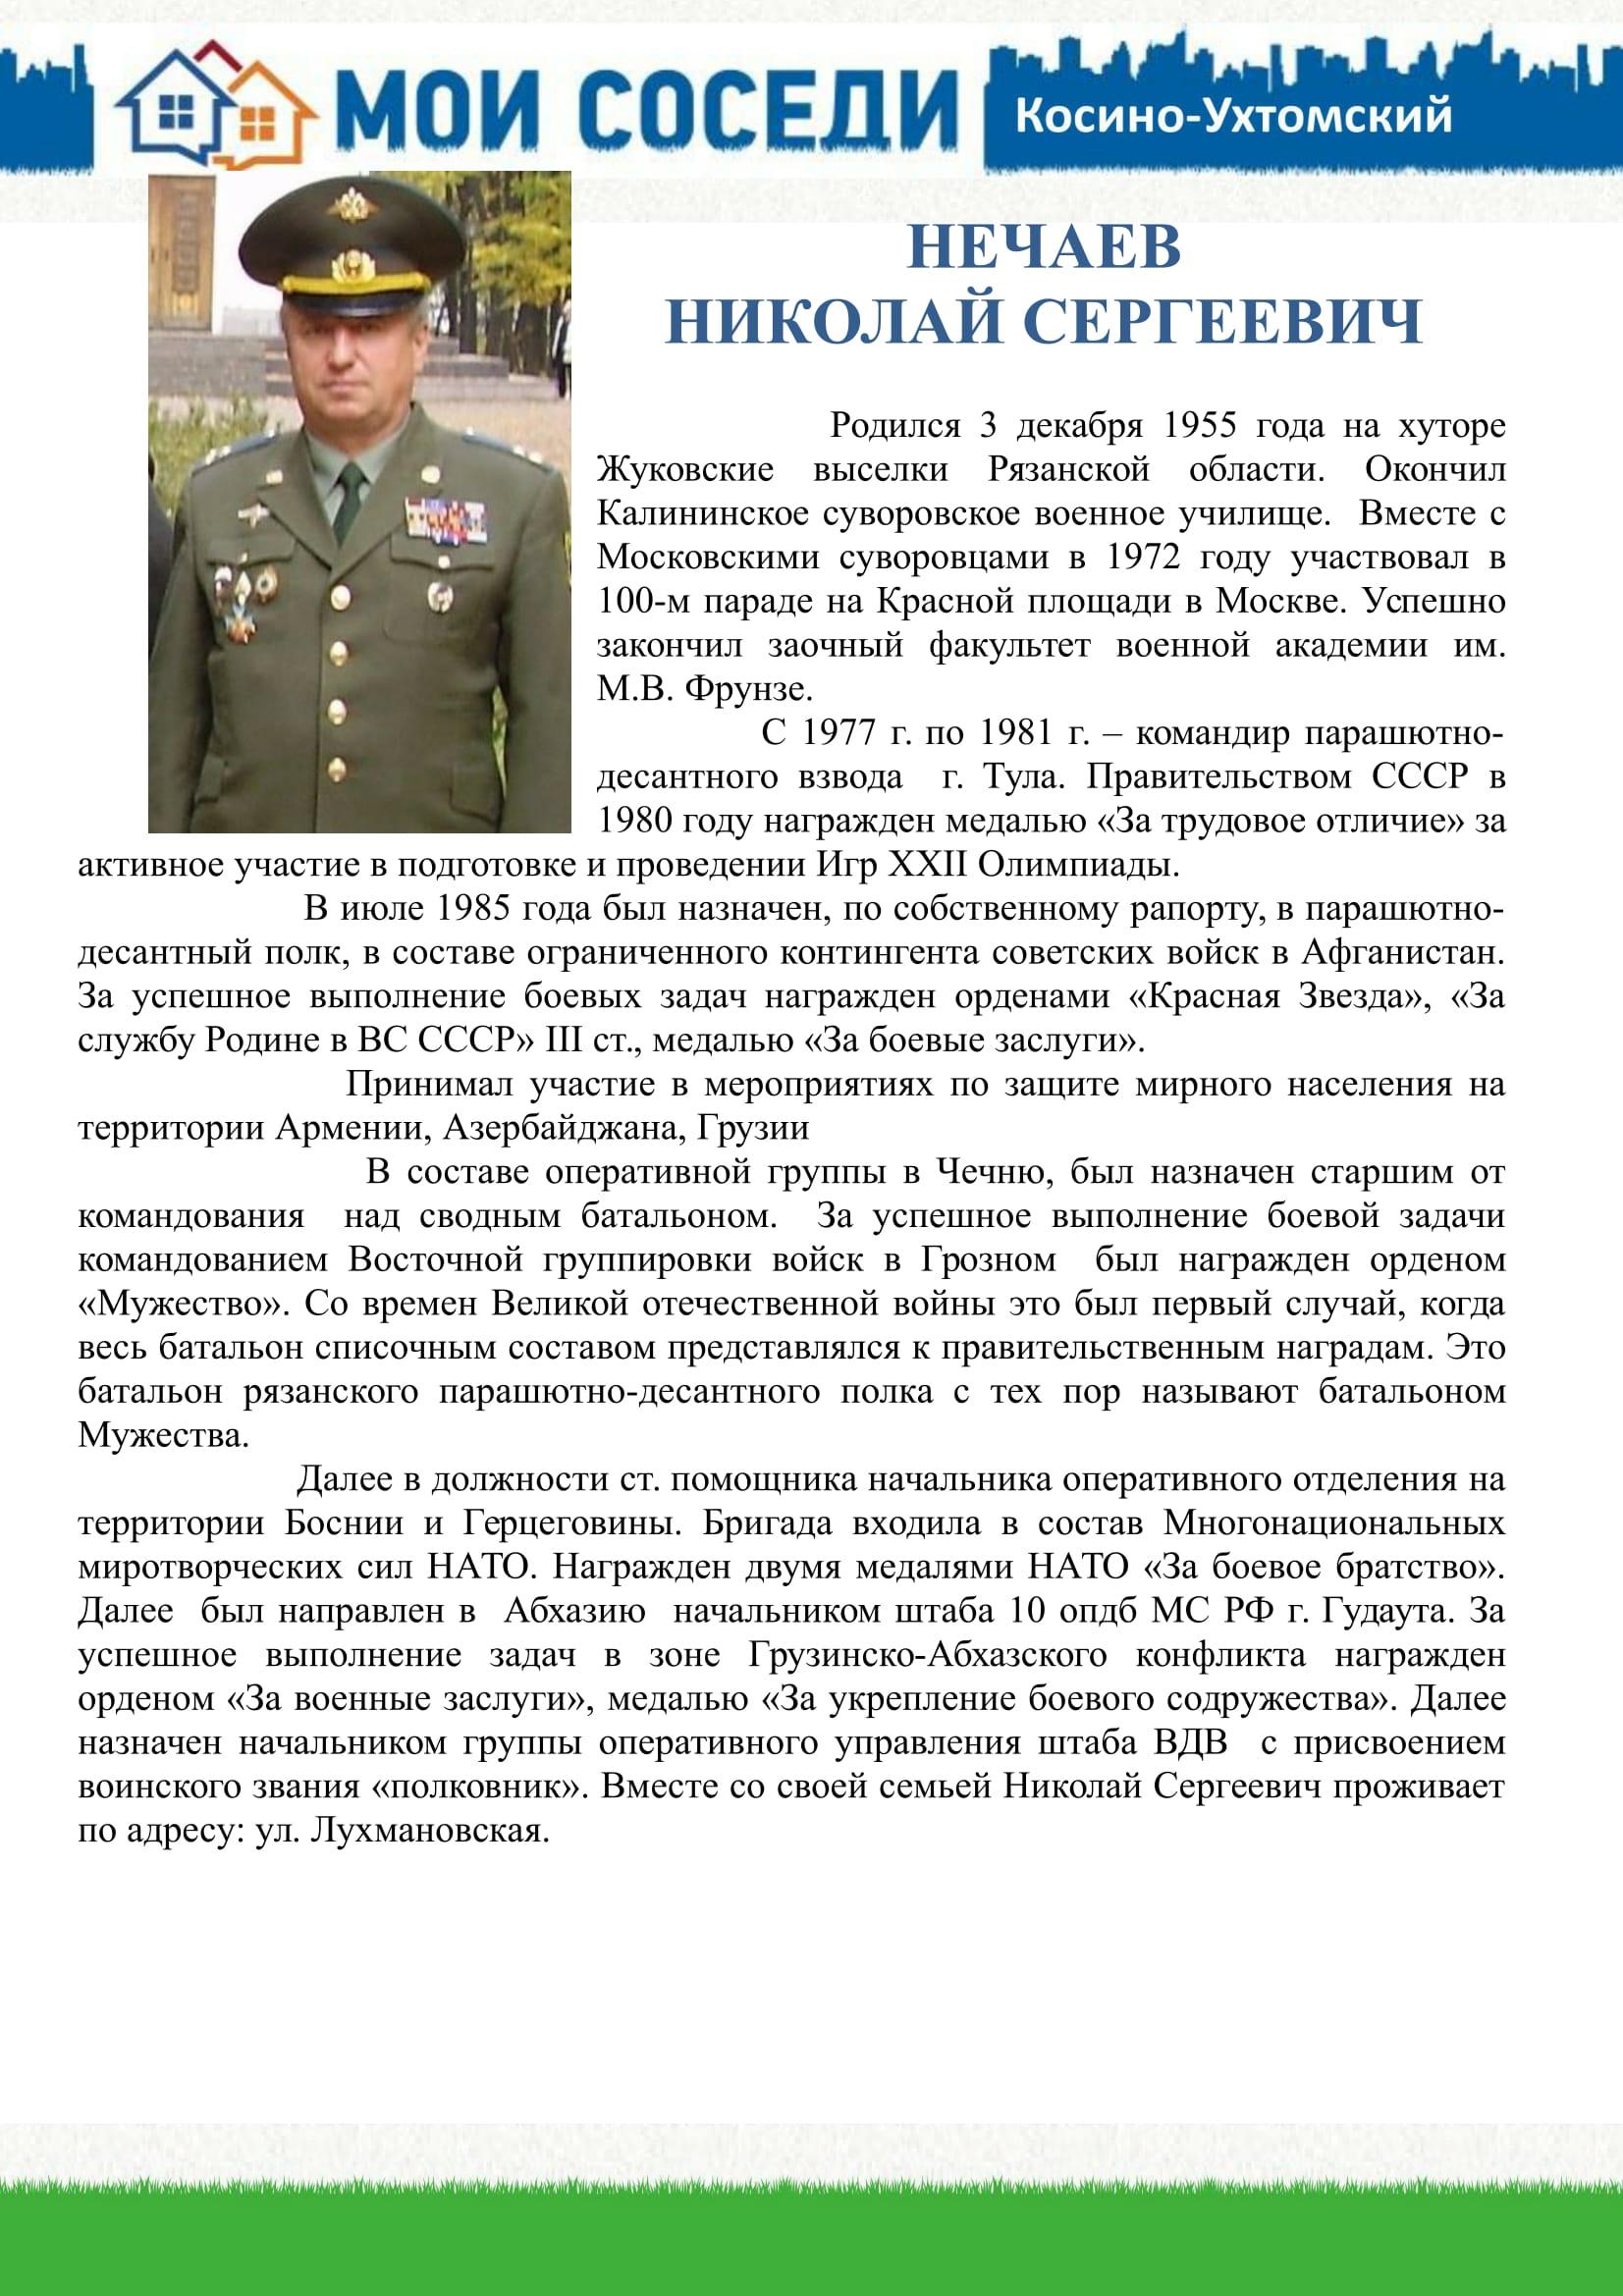 Нечаев-1